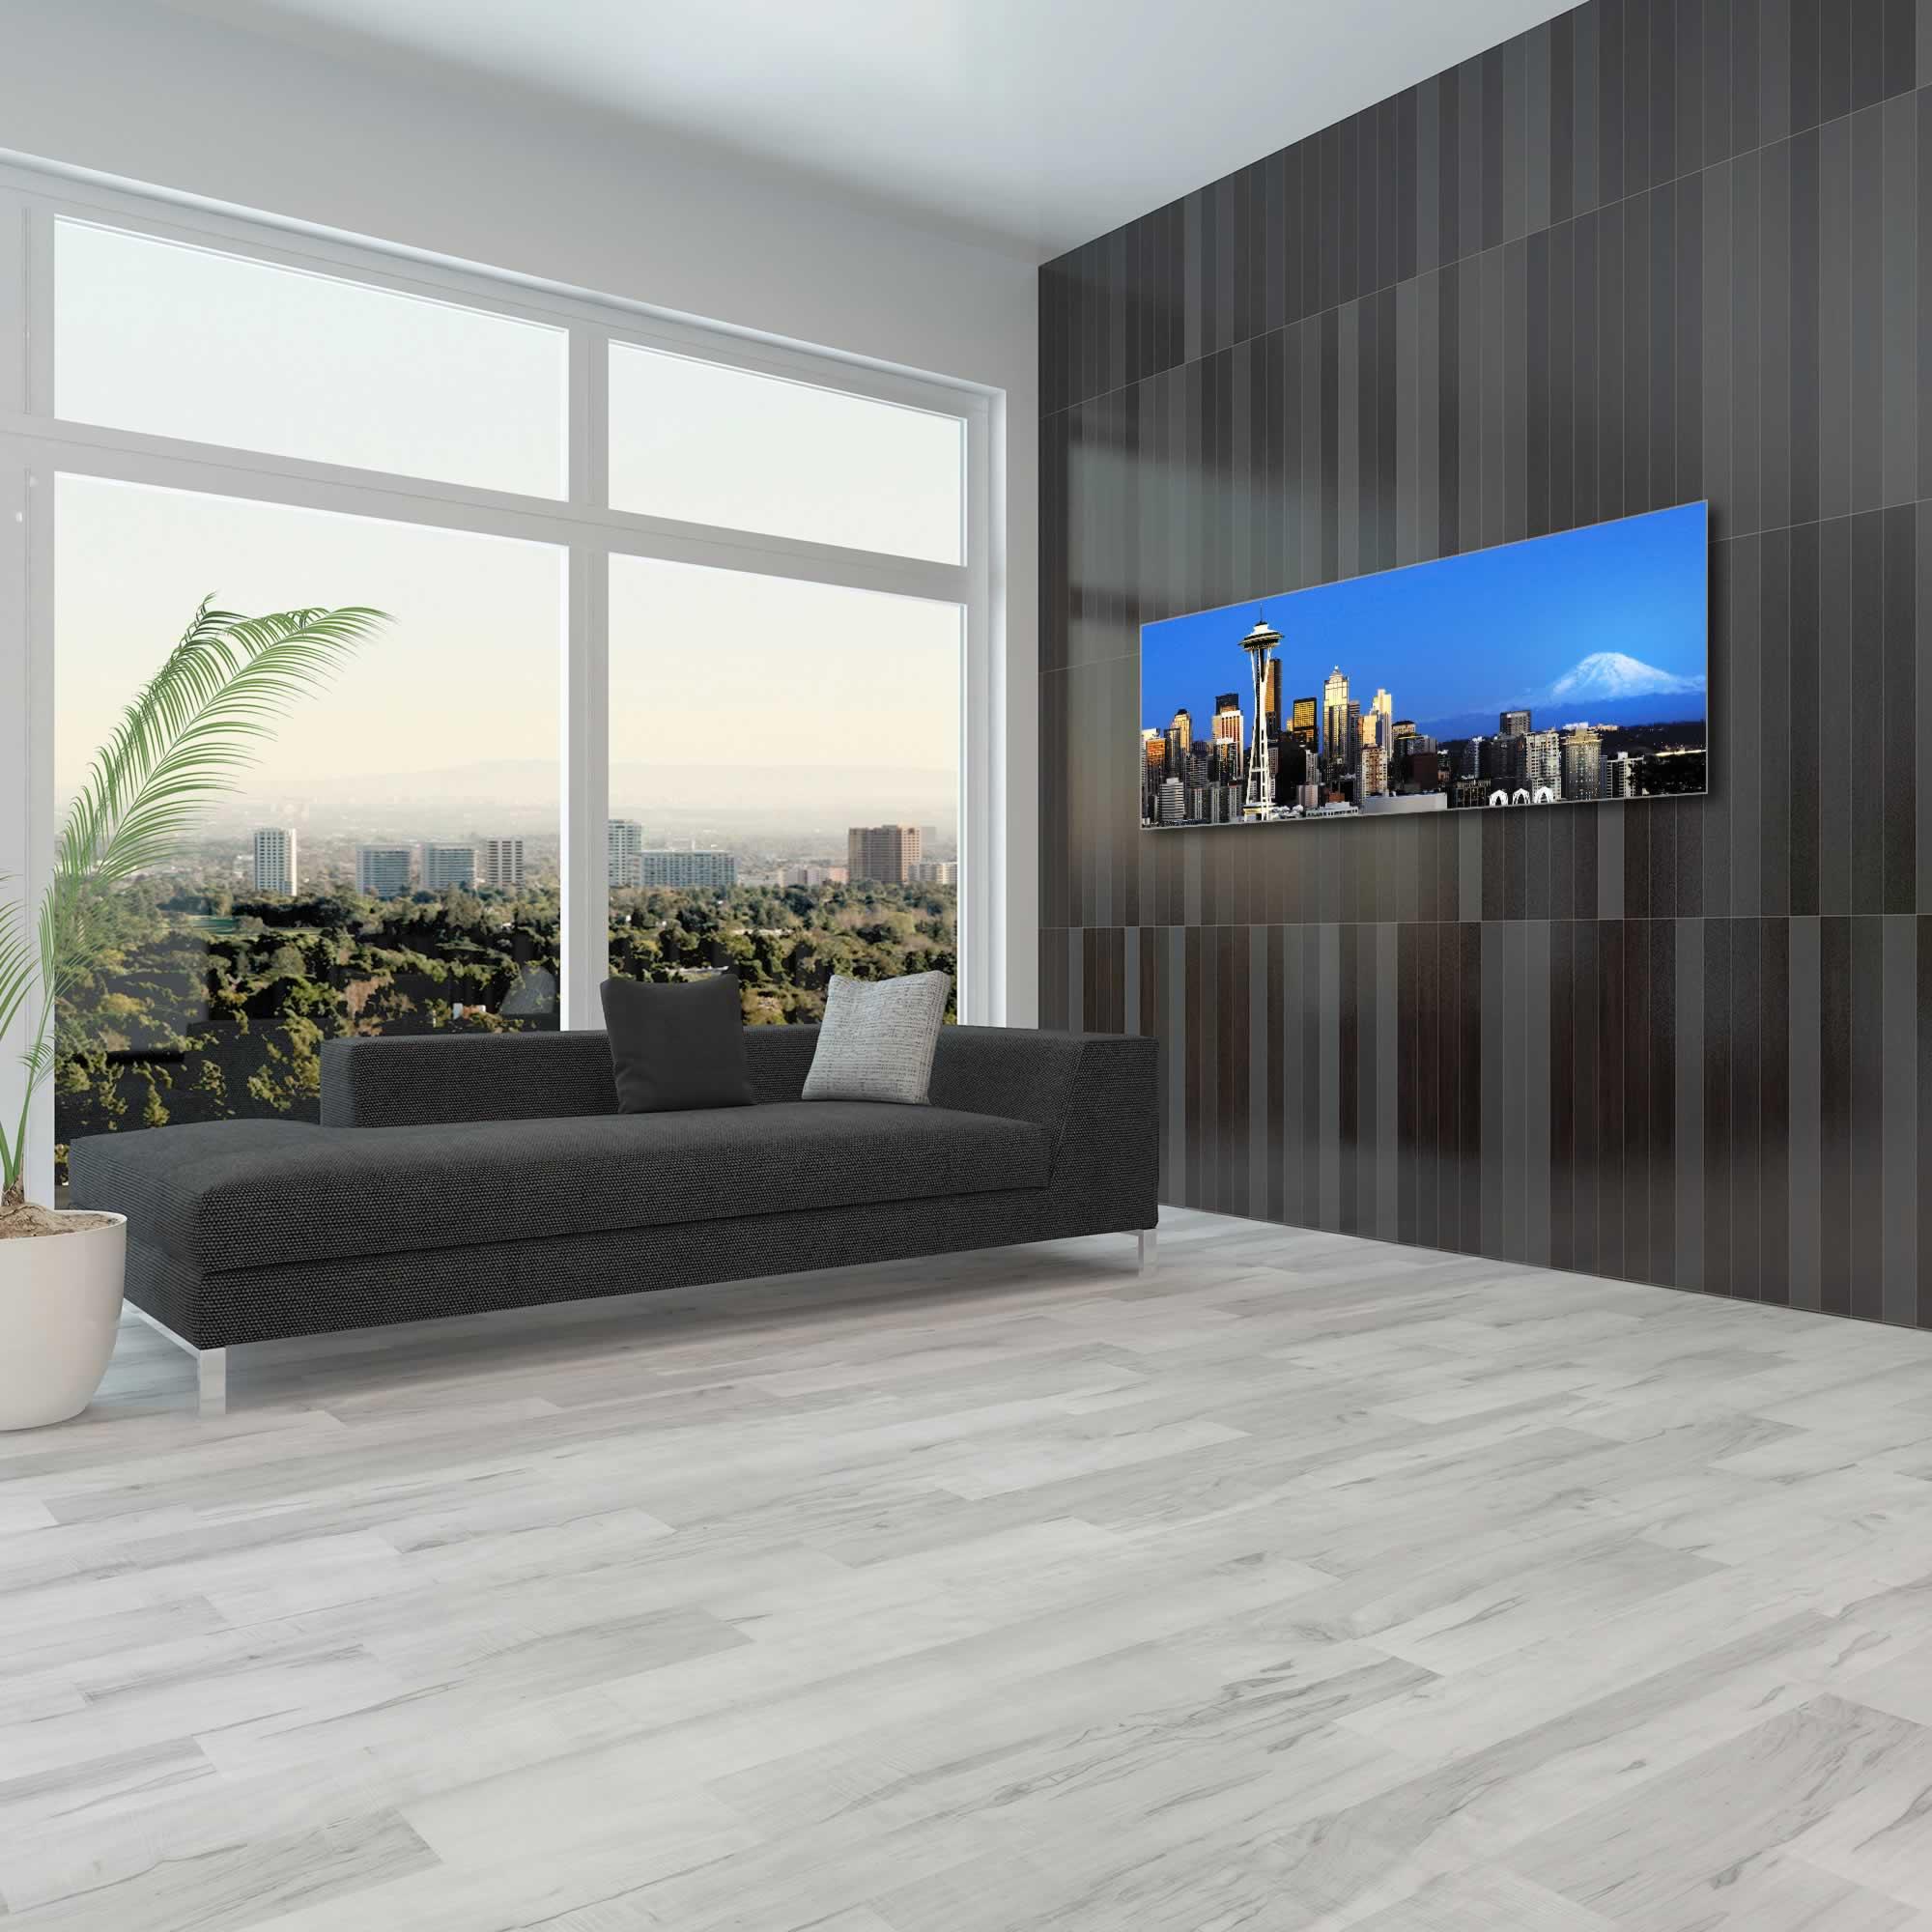 Seattle City Skyline - Urban Modern Art, Designer Home Decor, Cityscape Wall Artwork, Trendy Contemporary Art - Alternate View 1